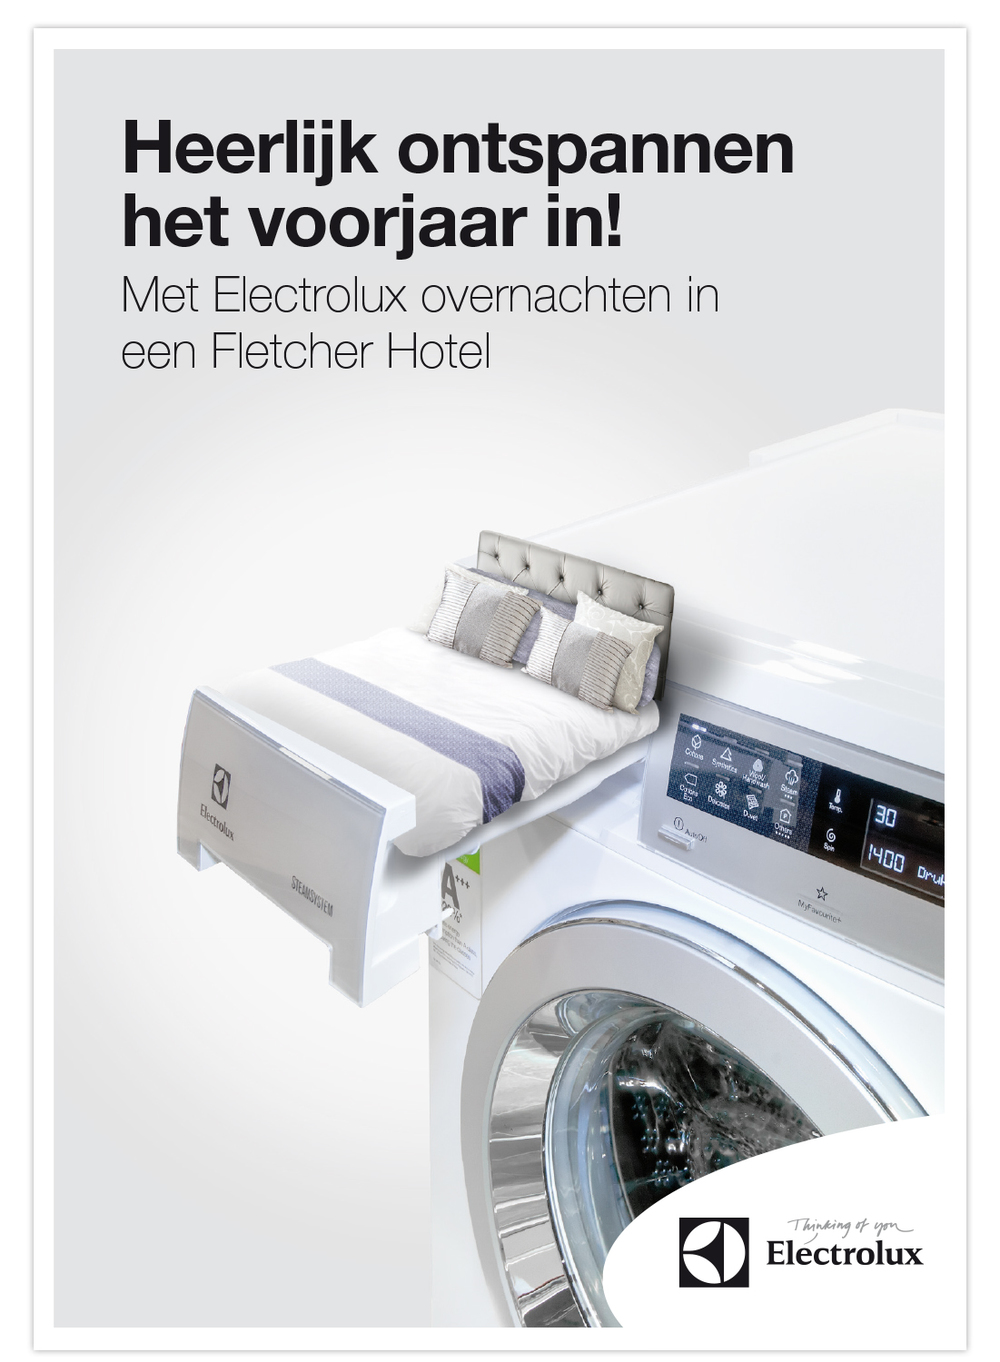 electrolux1.jpg